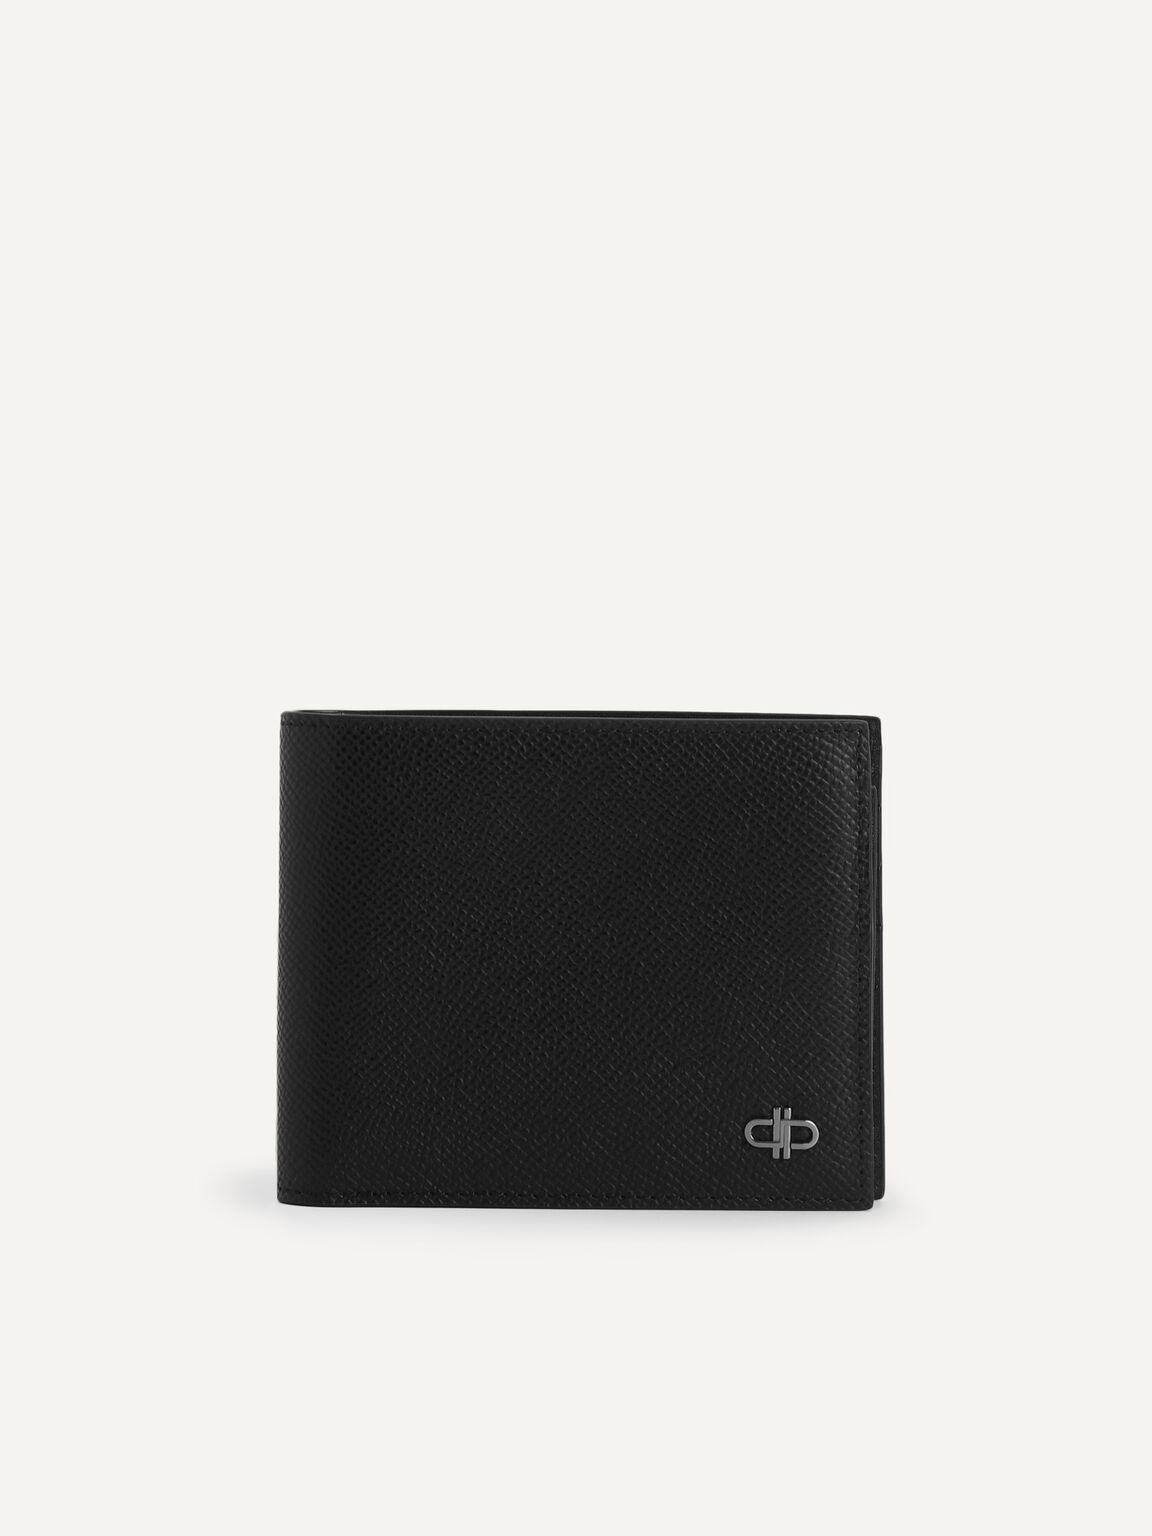 Icon雙折疊帶內袋皮革錢包, 黑色, hi-res